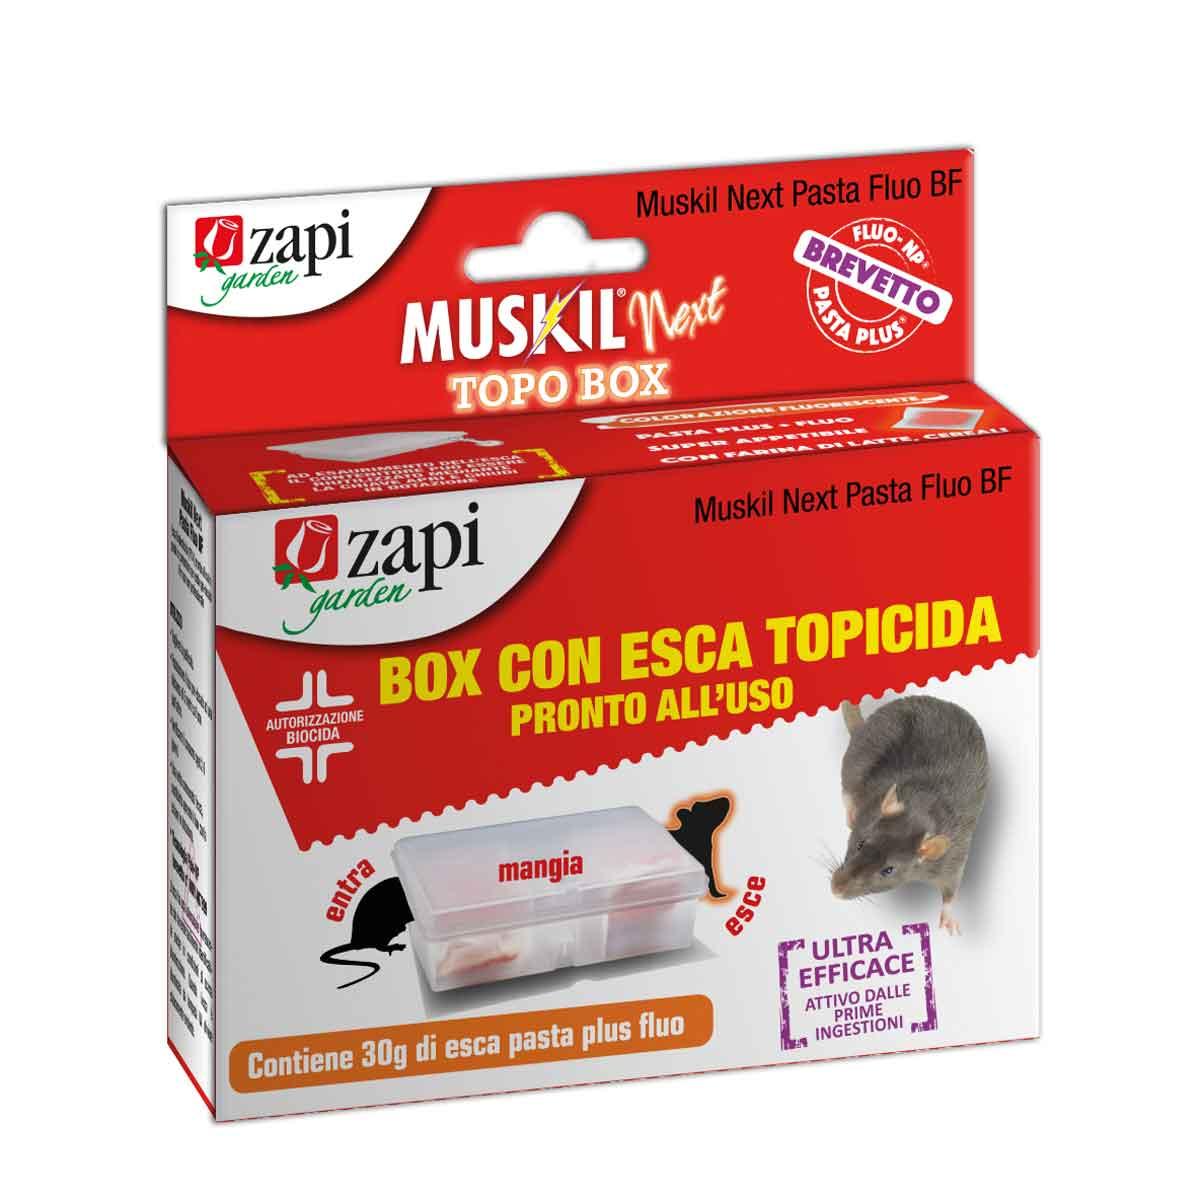 Zapi Muskil® Next Pasta Fluo BF Topo Box